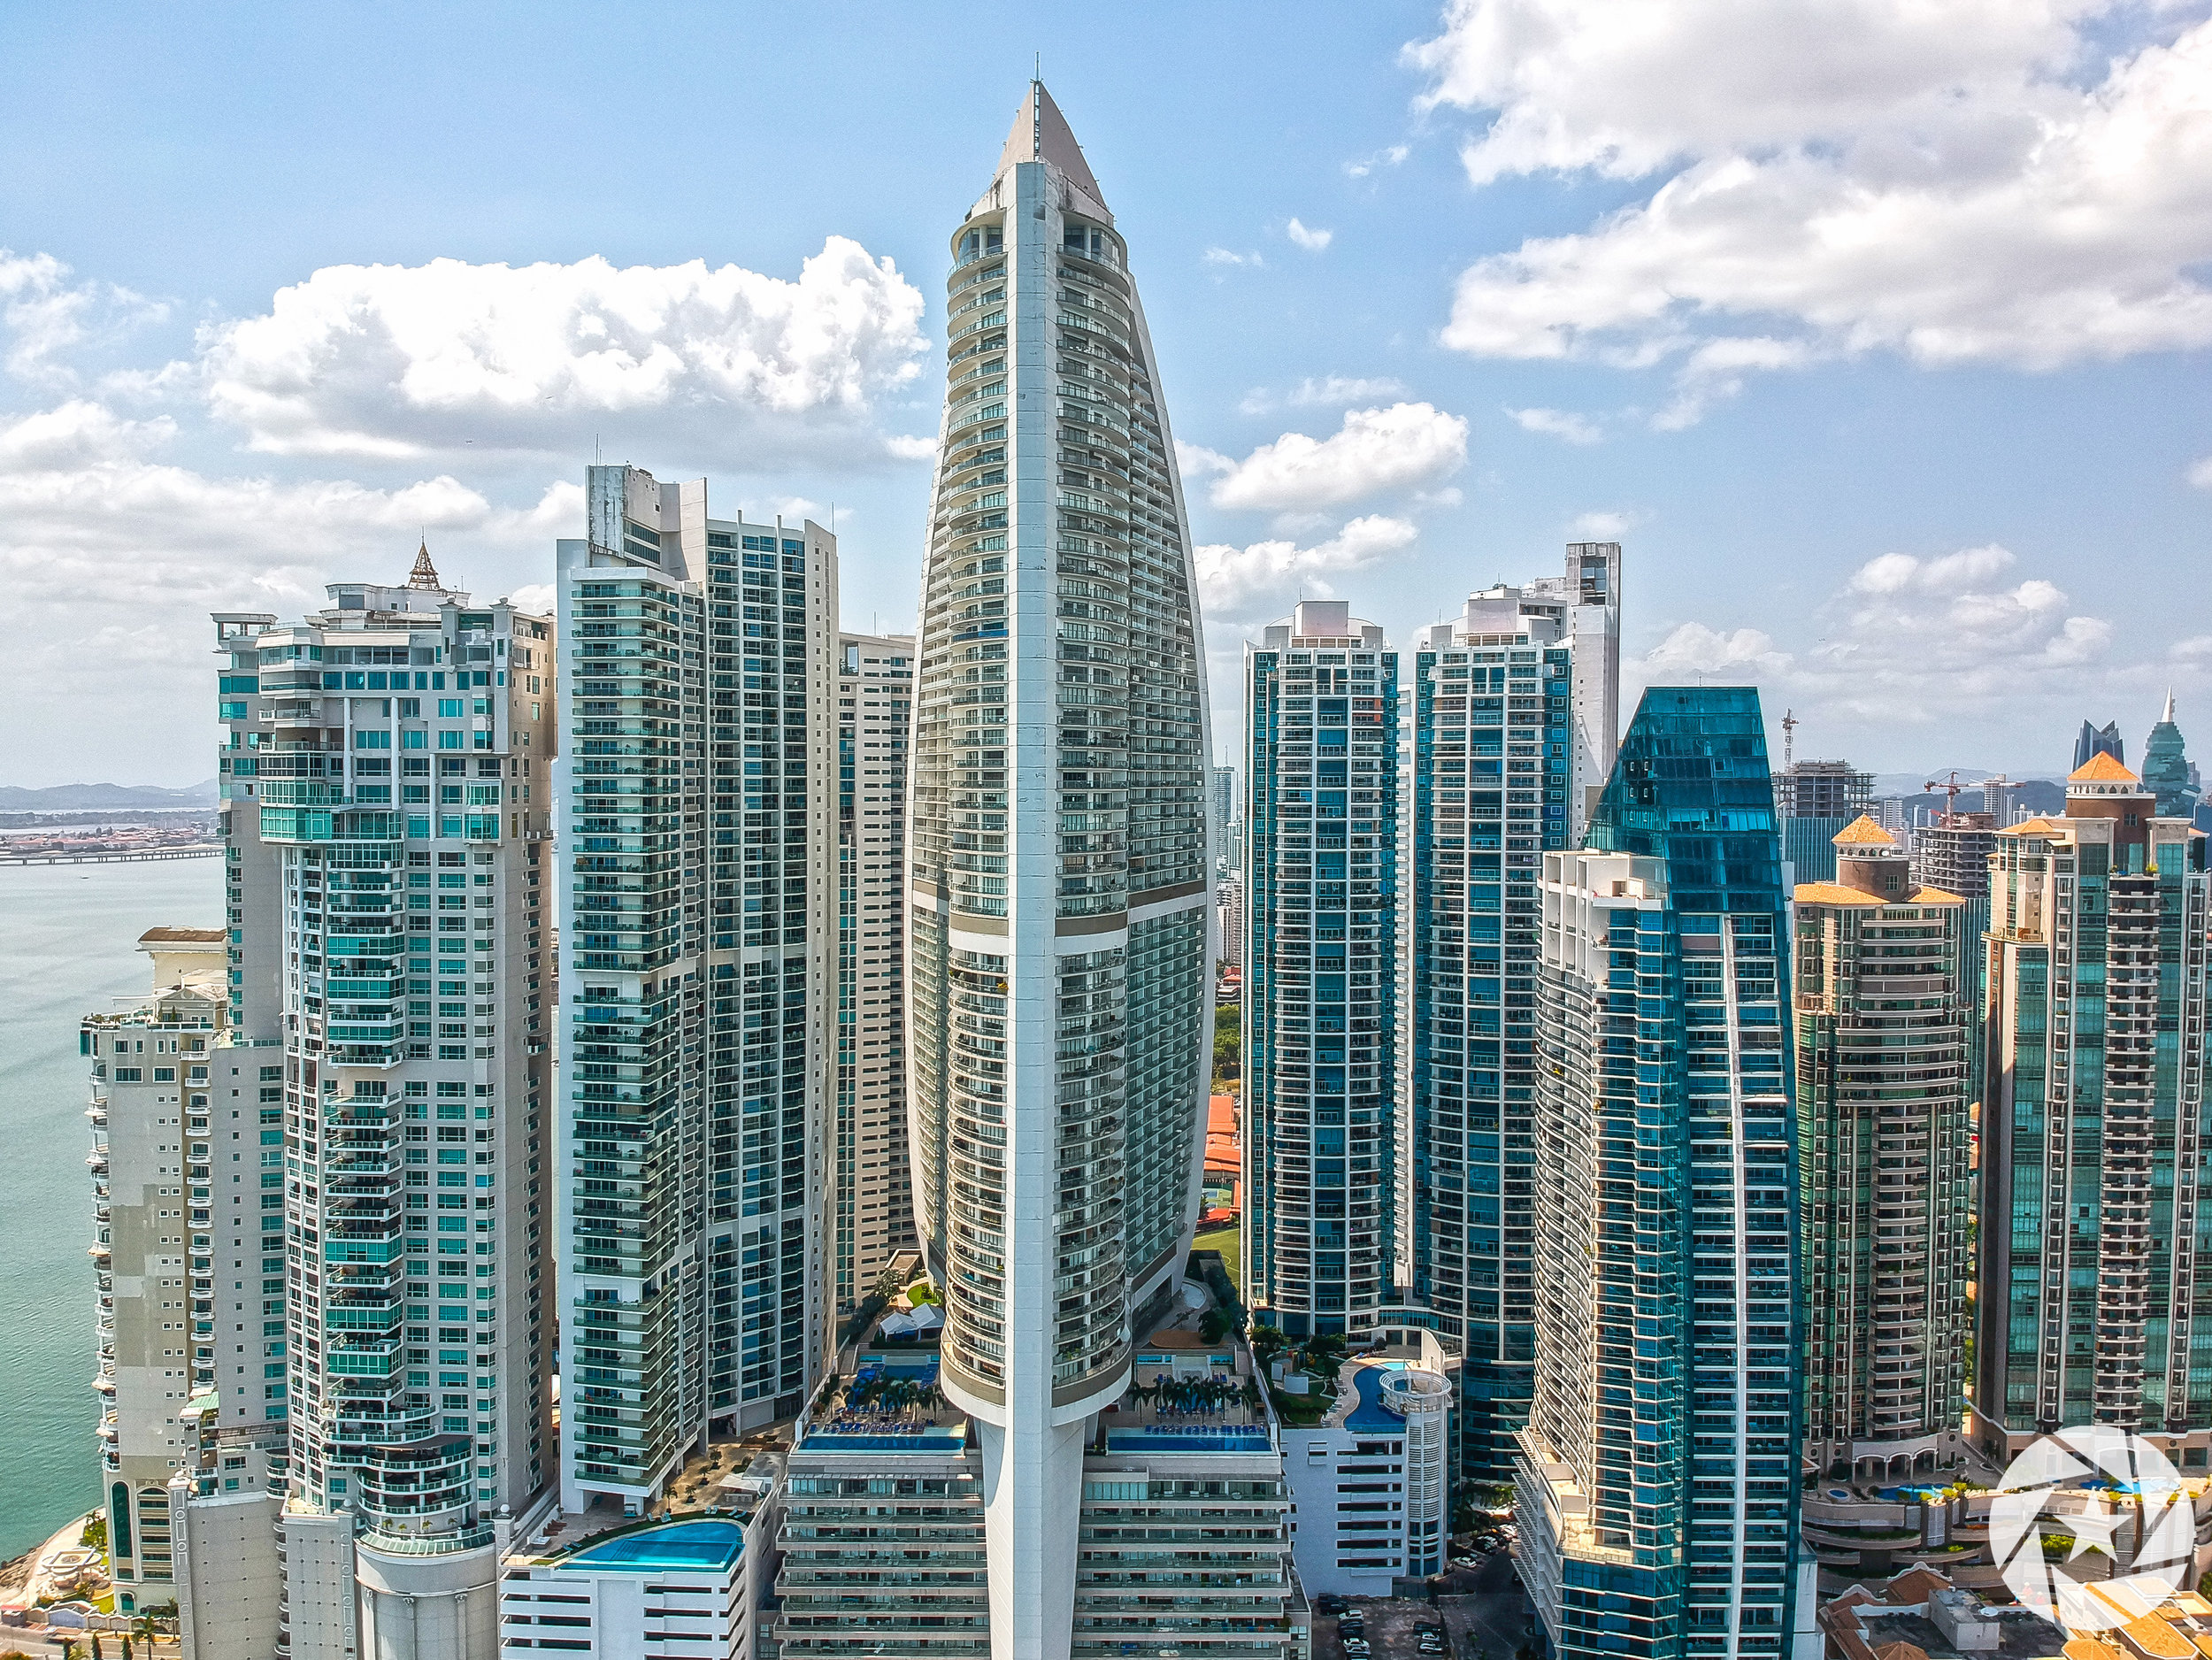 Aerial photo of Trump International Hotel in Panama City.